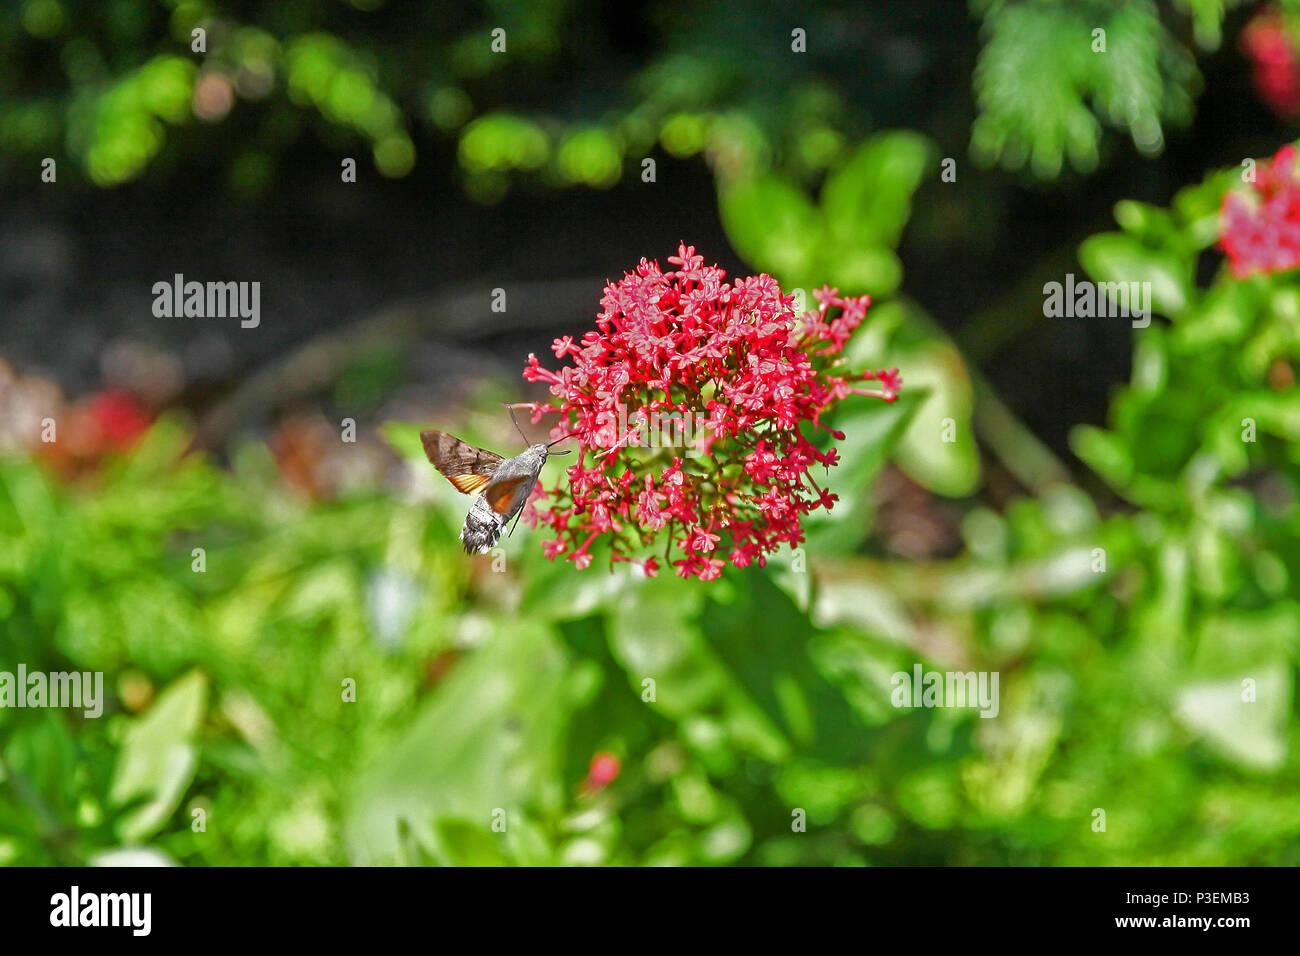 A Hummingbird hawk moth (Macroglossum stellatarum) hovering next to a Red Valerian (Centranthus ruber) flower - Stock Image